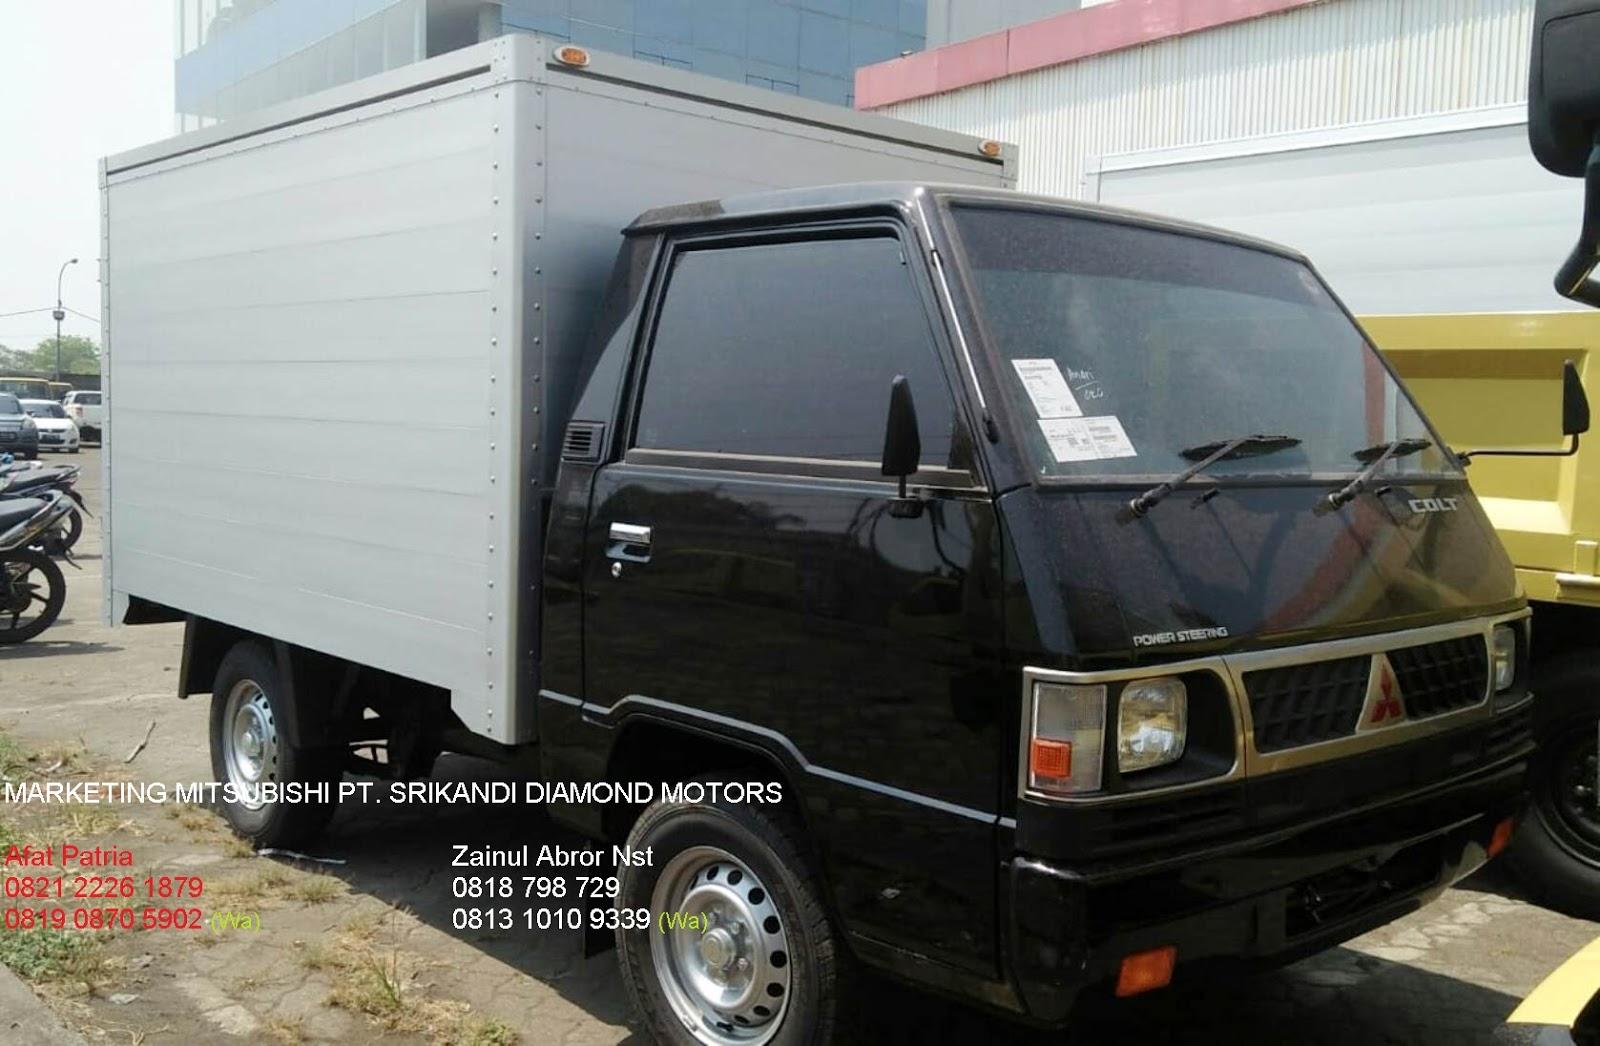 Dealer Mitsubishi Niaga Dki Jakarta Harga Mitsubishi L300 Tahun